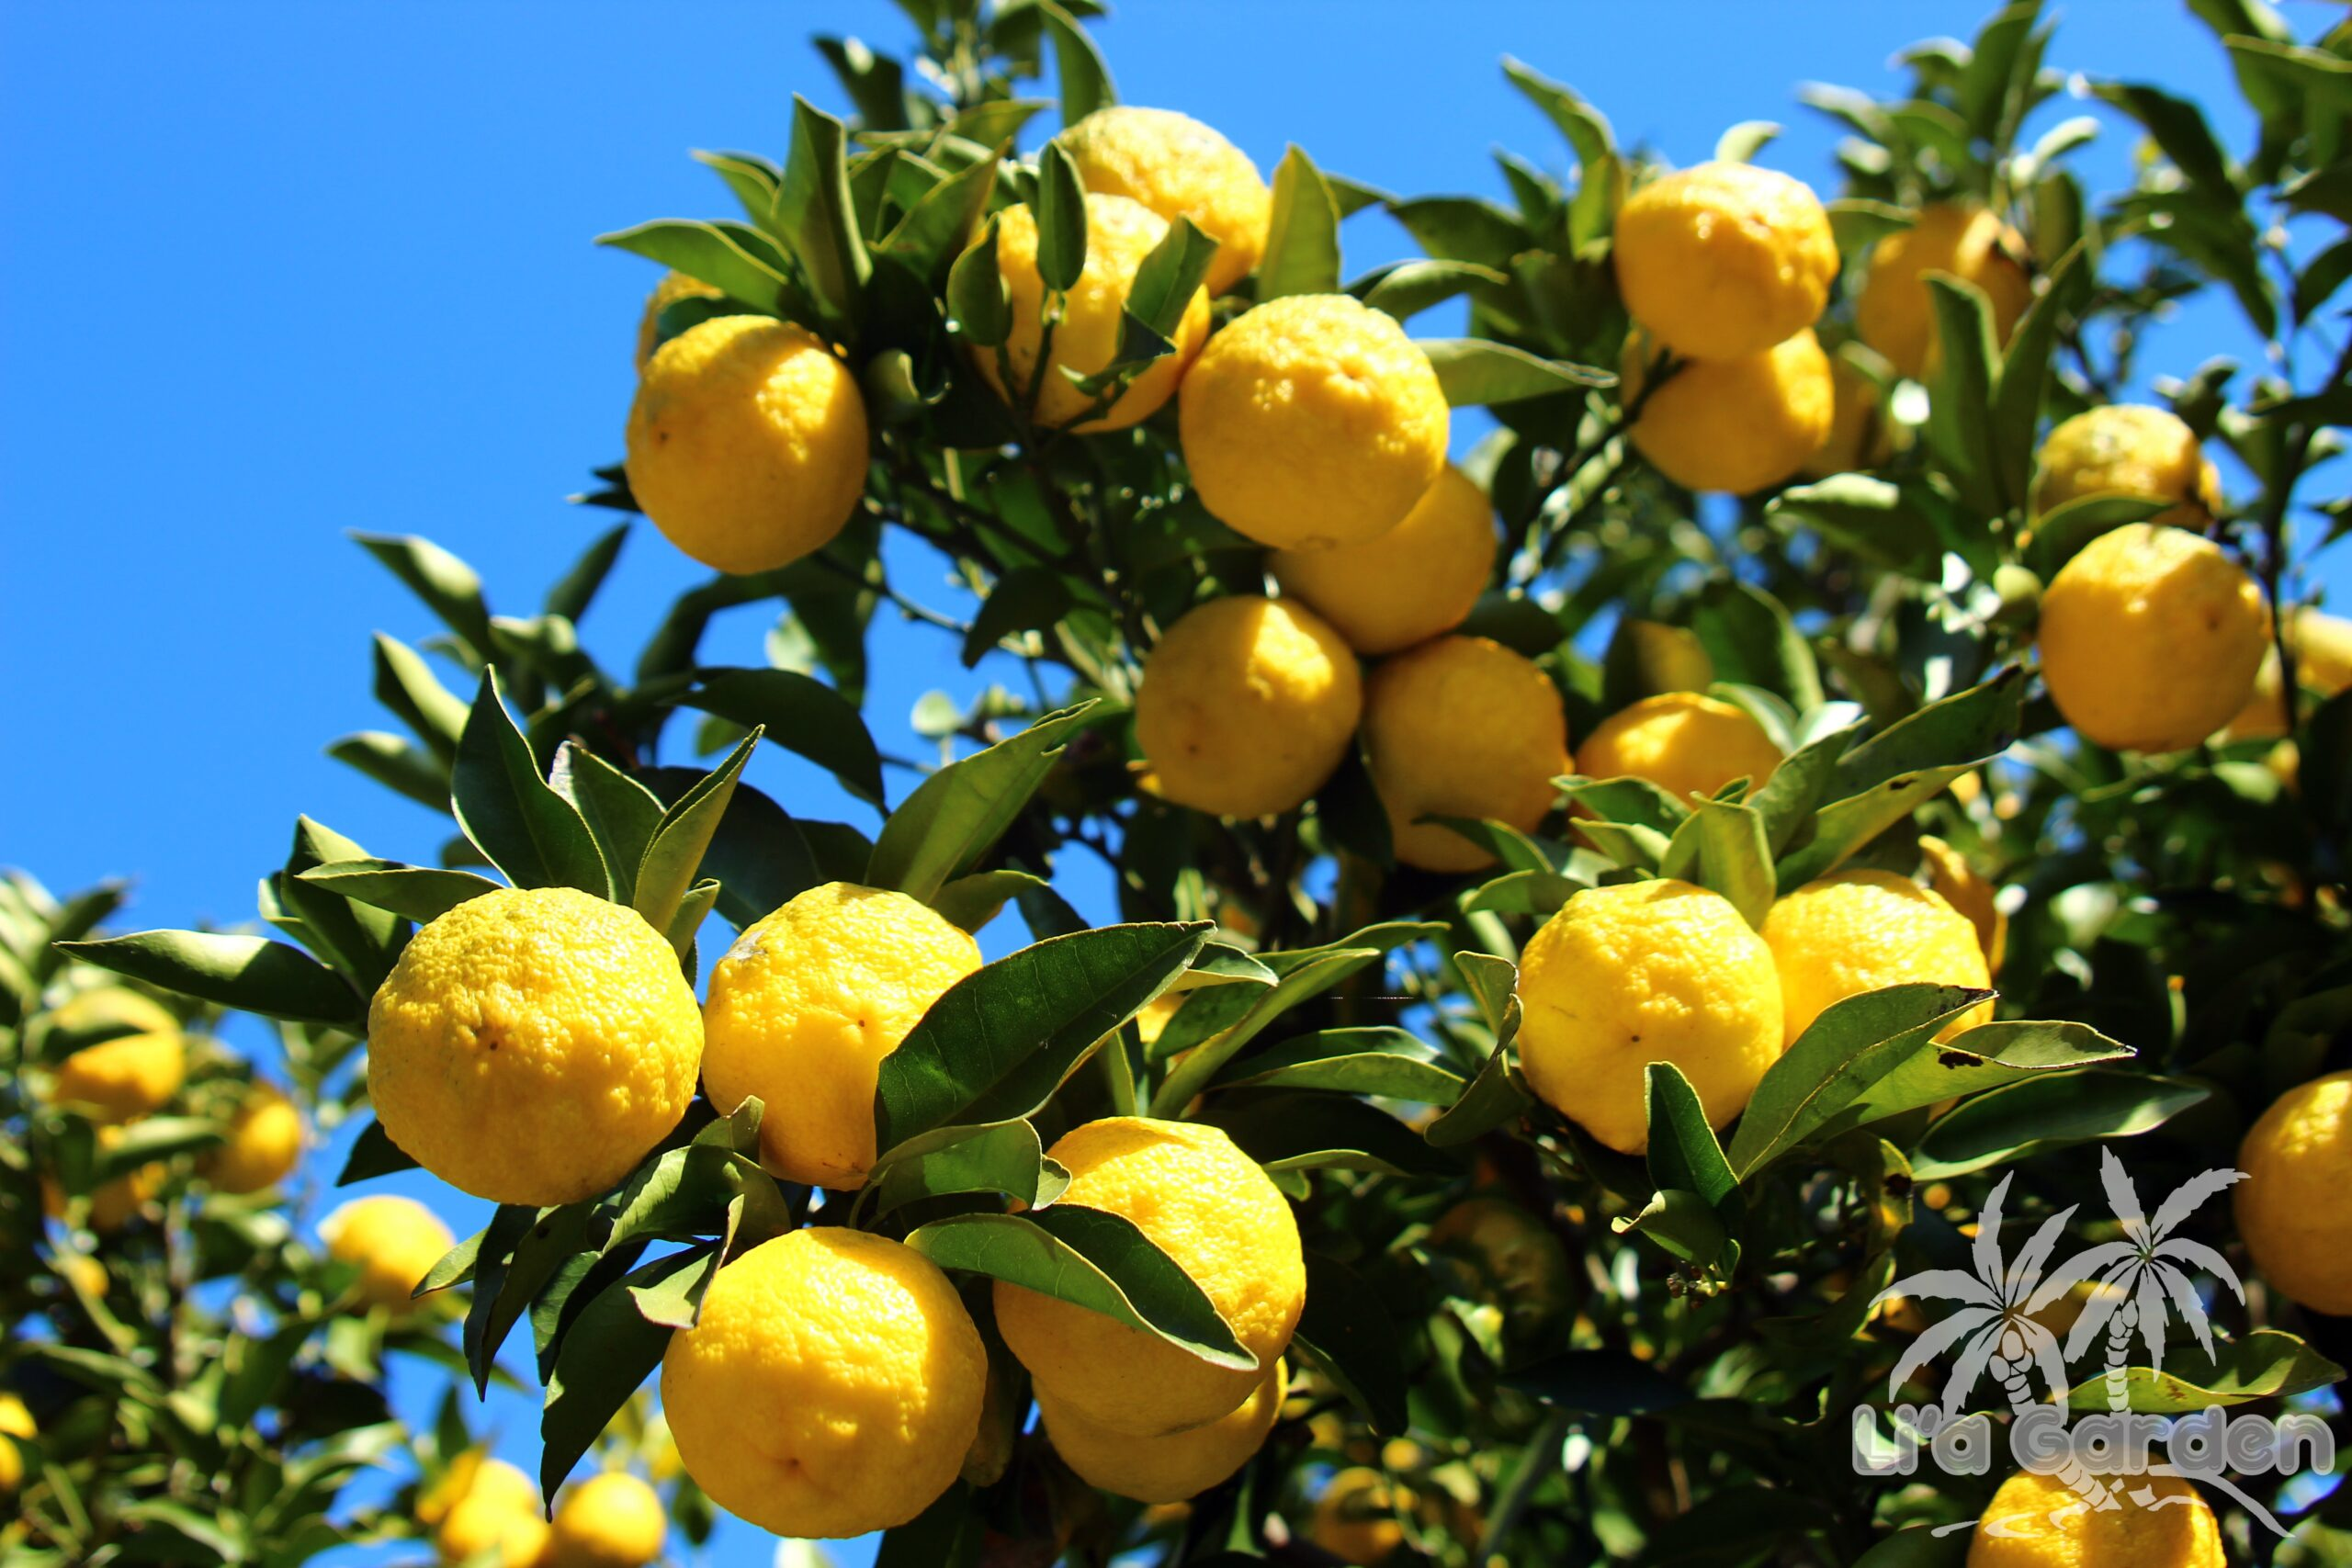 【中木】 ユズ Citrus junos 〈常緑広葉樹〉